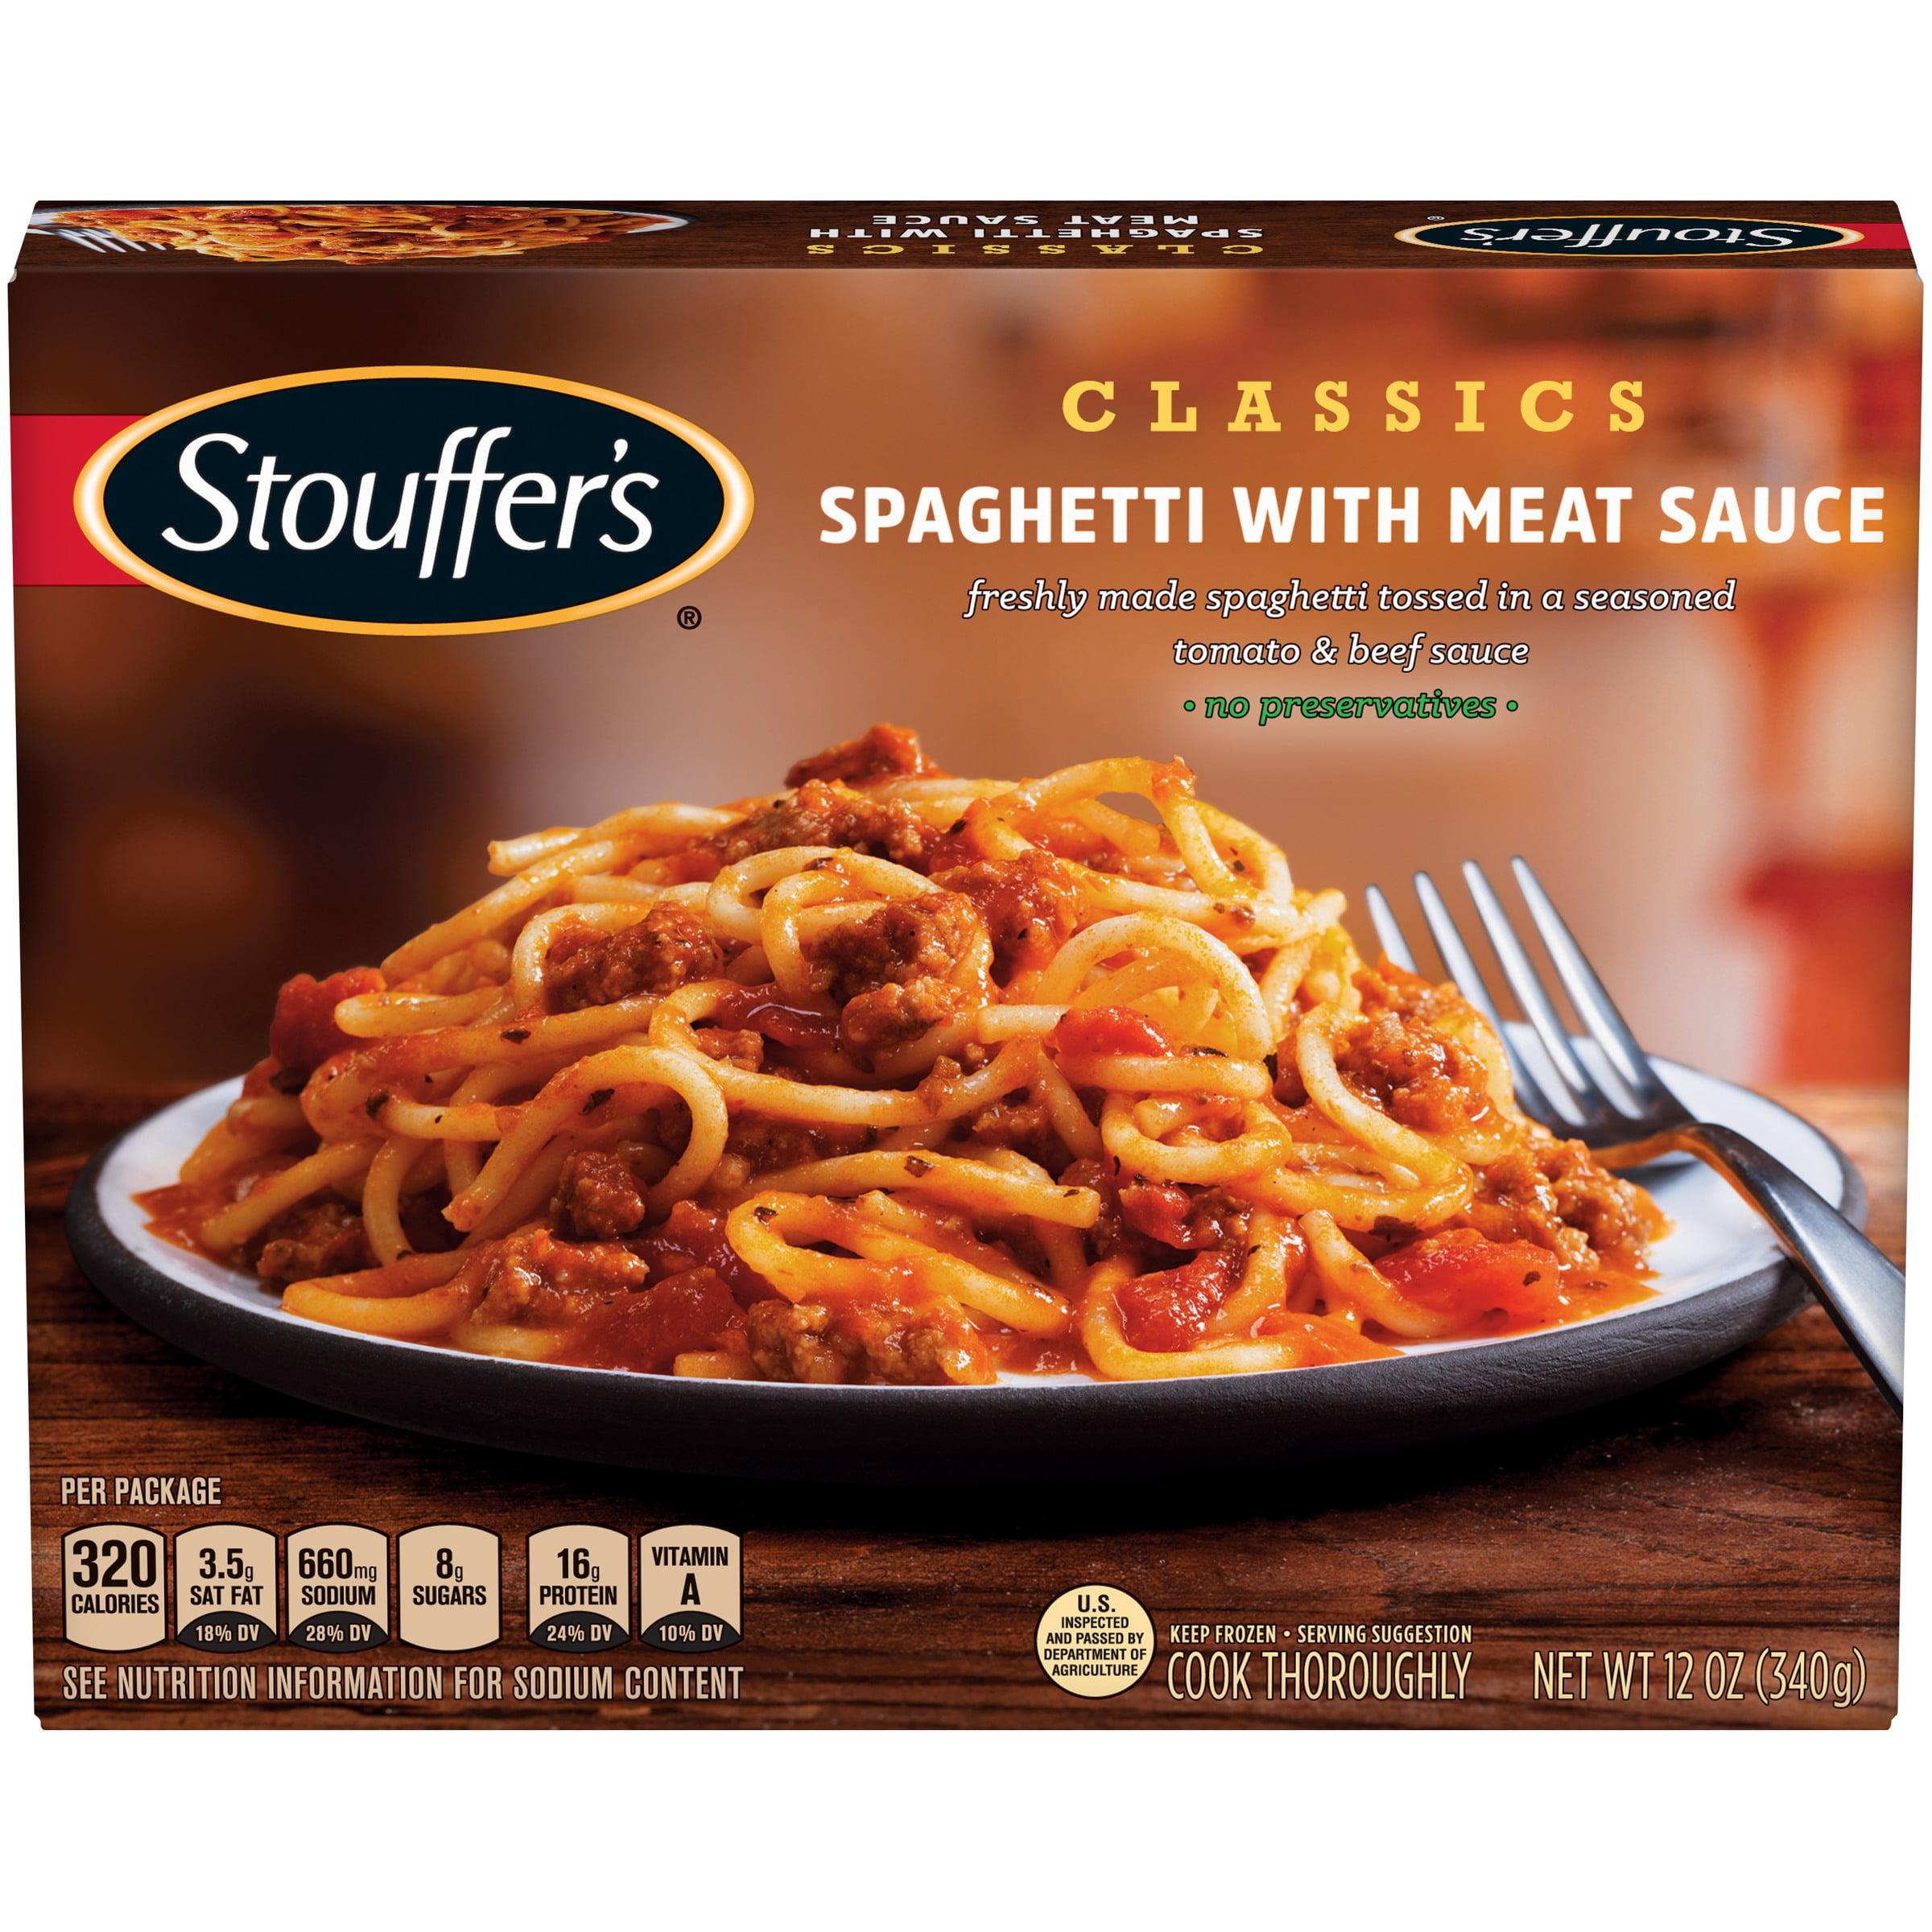 STOUFFER'S CLASSICS Spaghetti with Meat Sauce 12 oz. Box